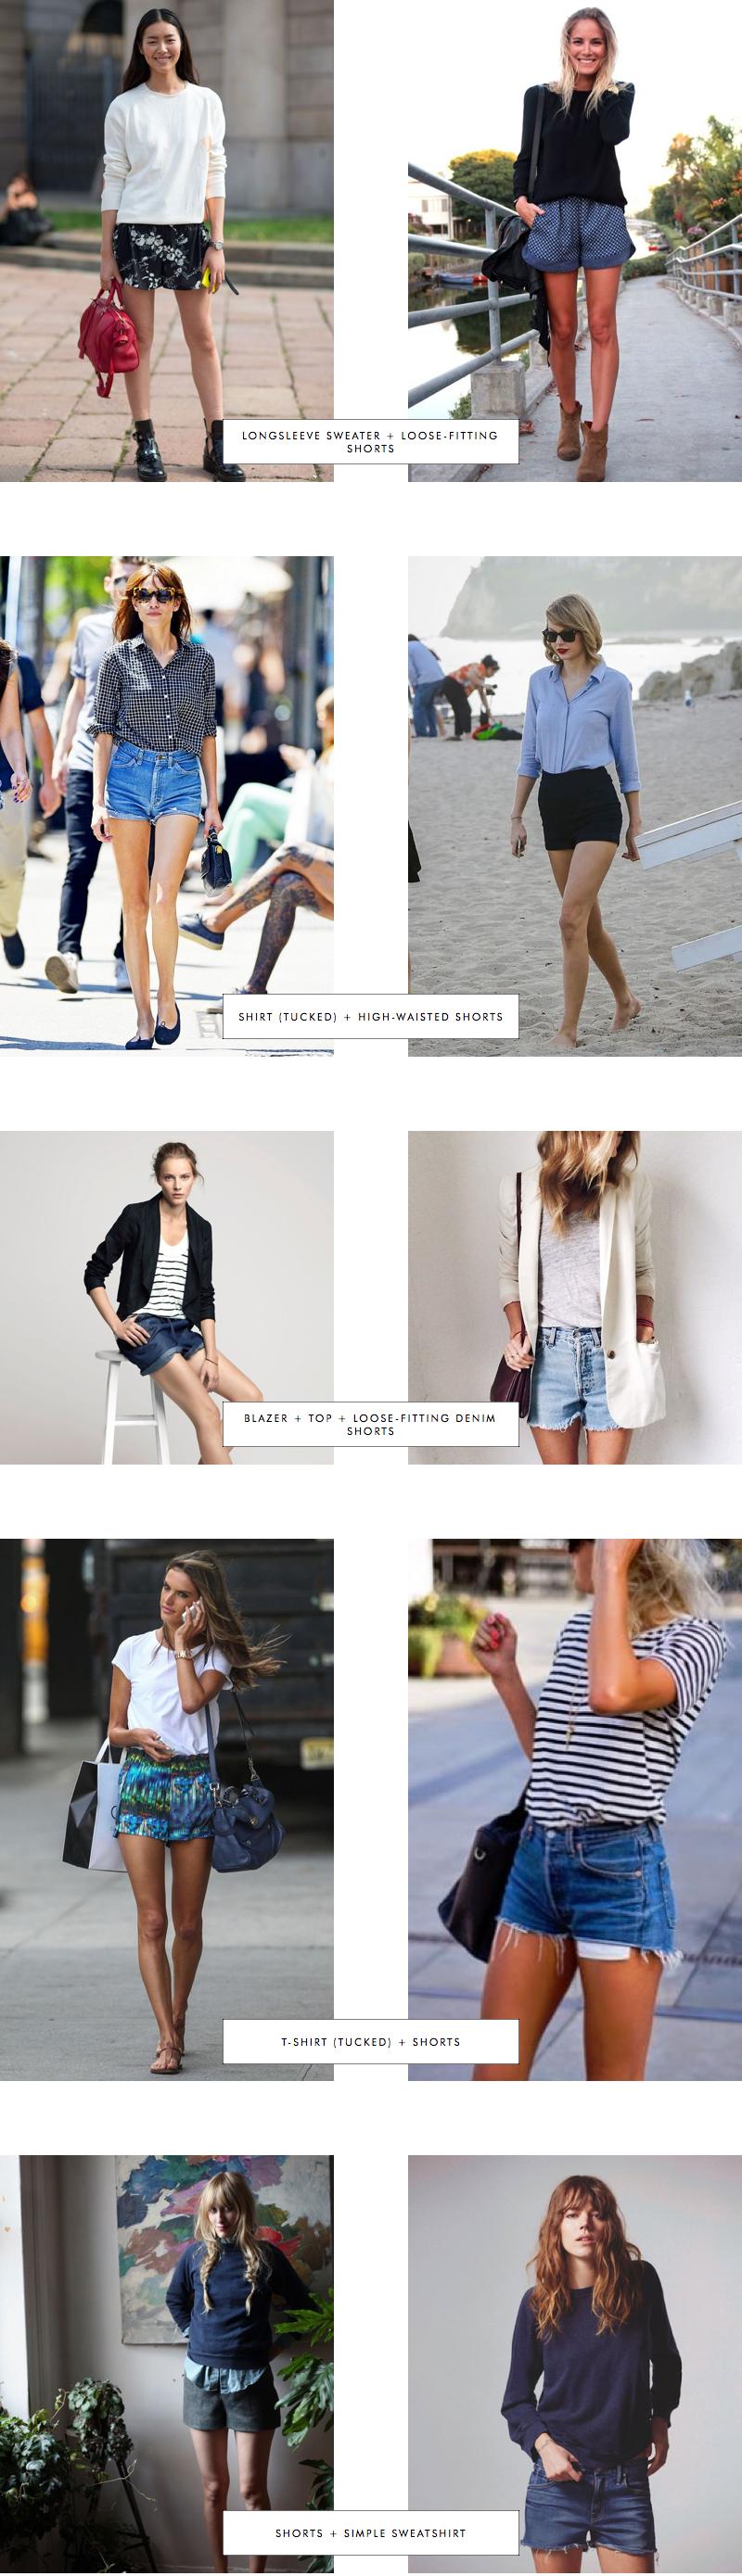 Proportions Catalogue Spring Edition: Shorts